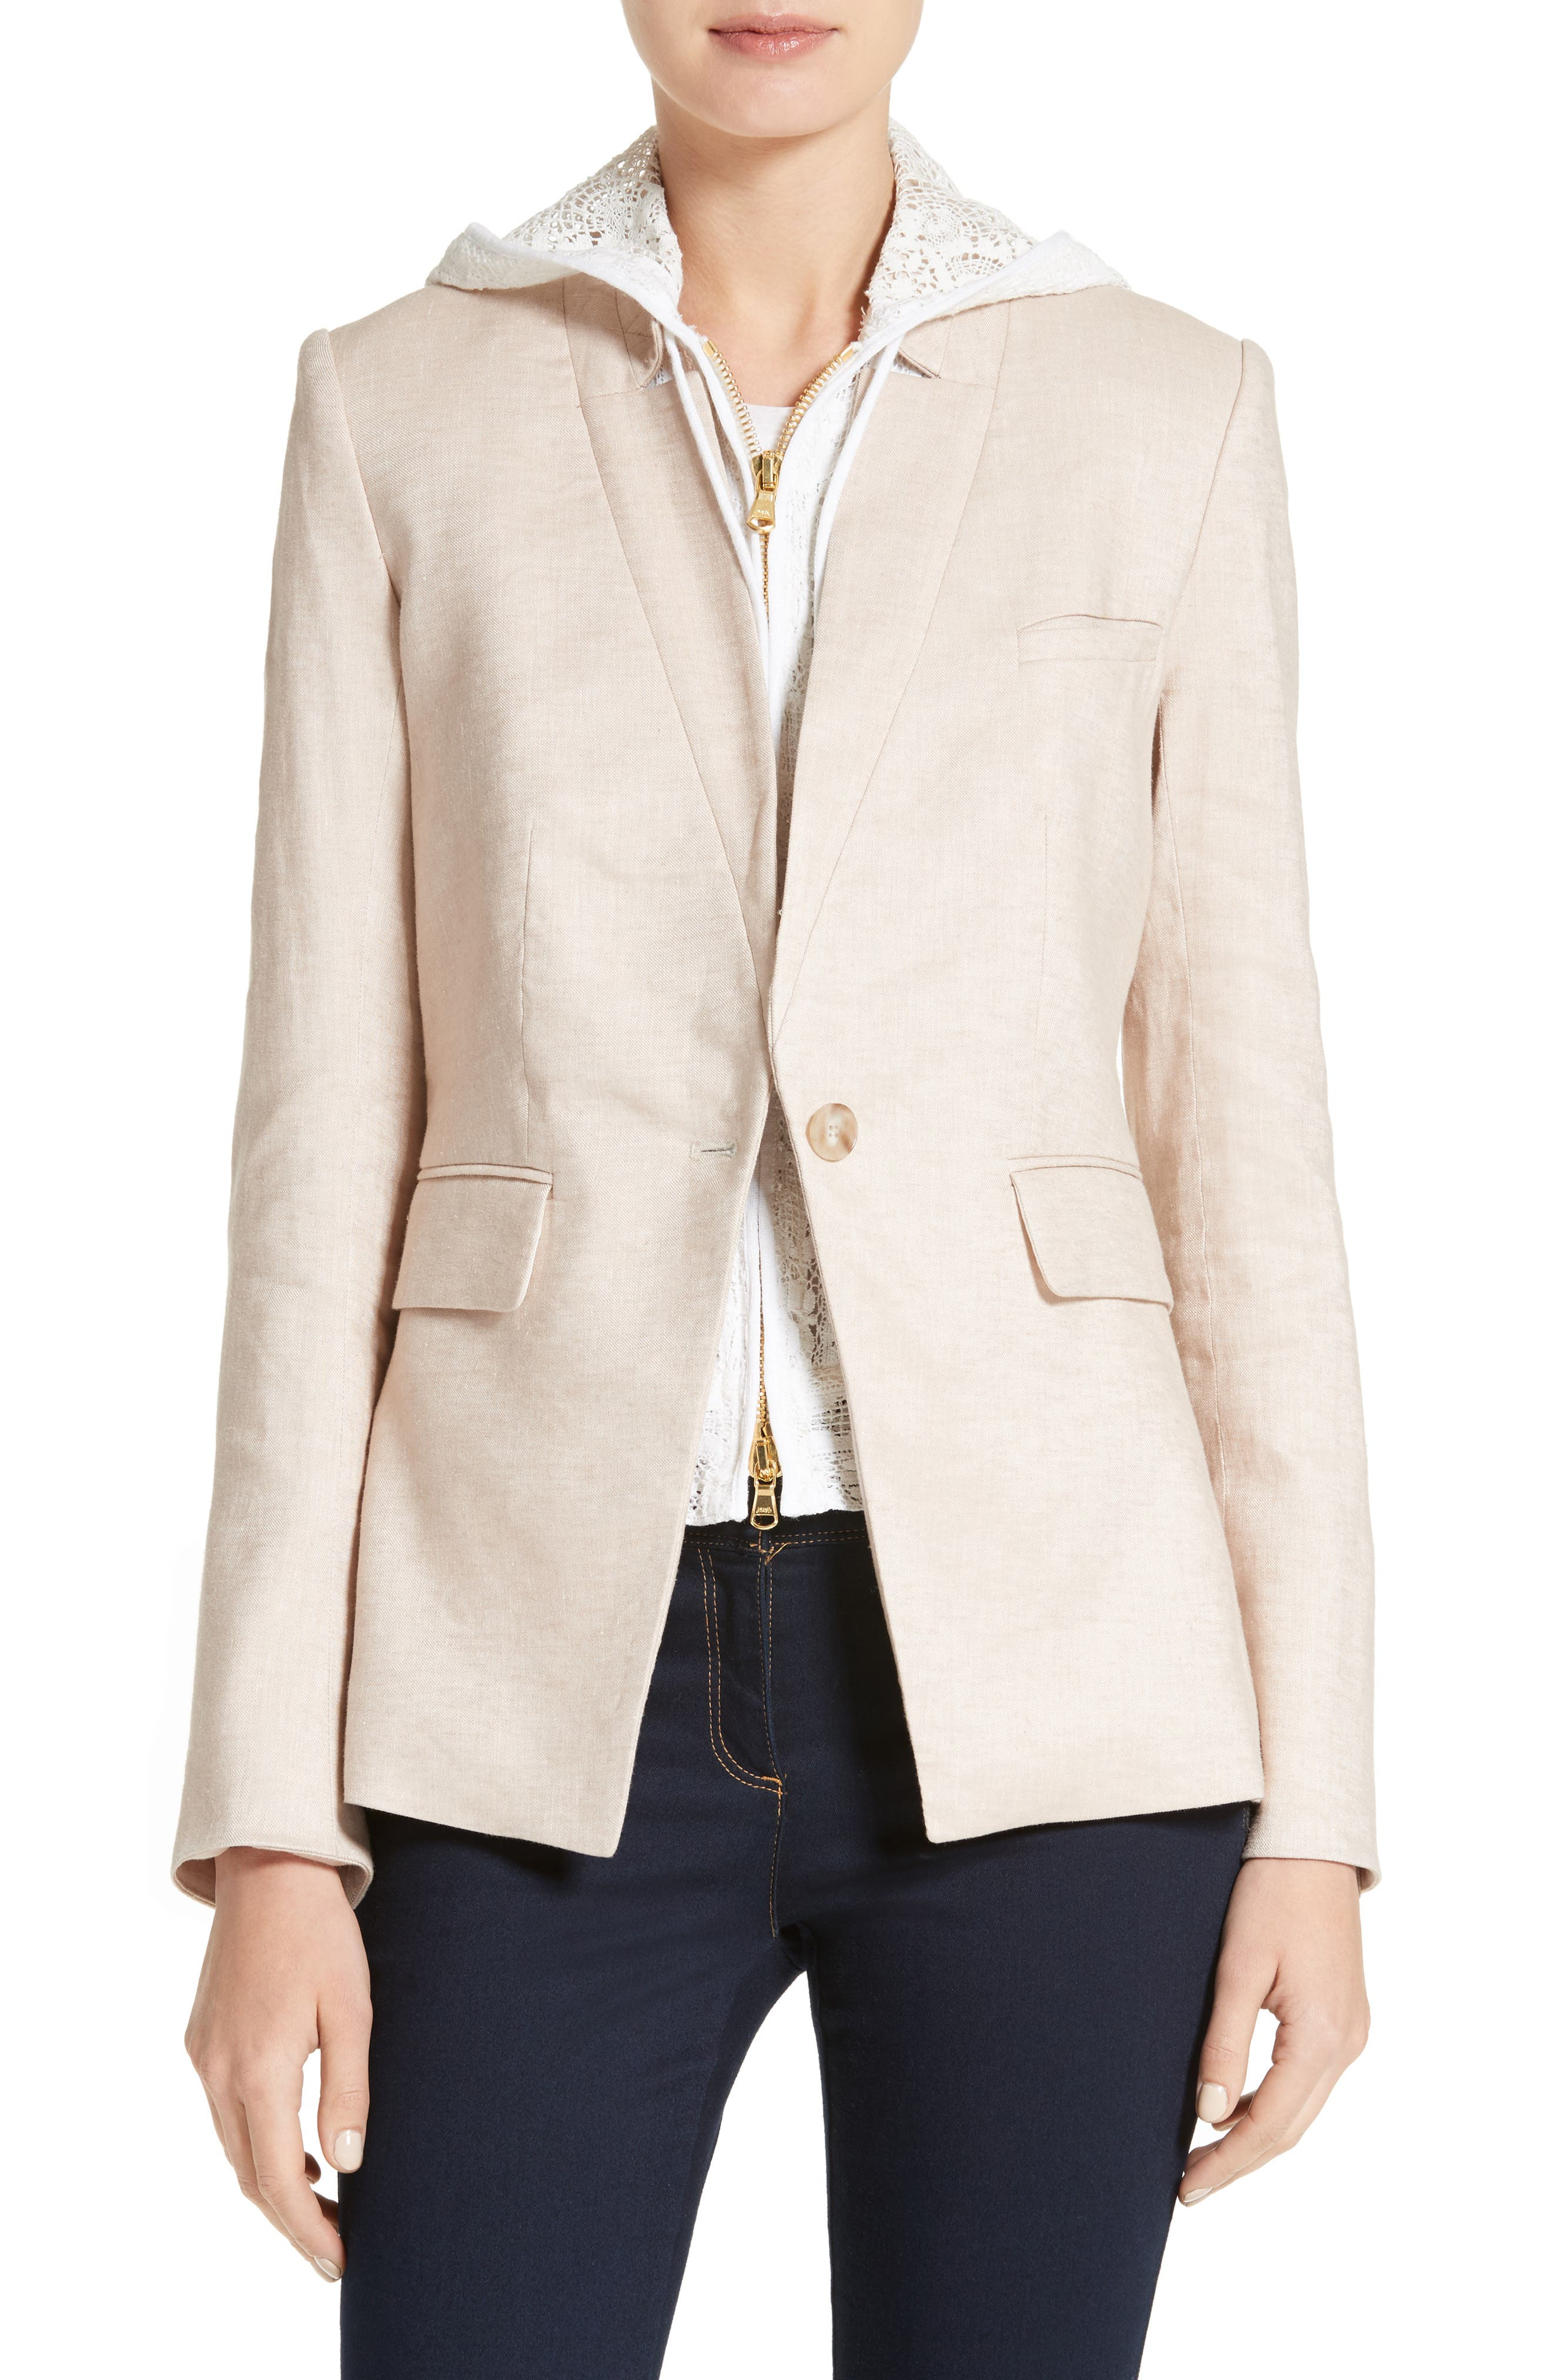 Turn-Up Collar Jacket,                         Main,                         color, 250